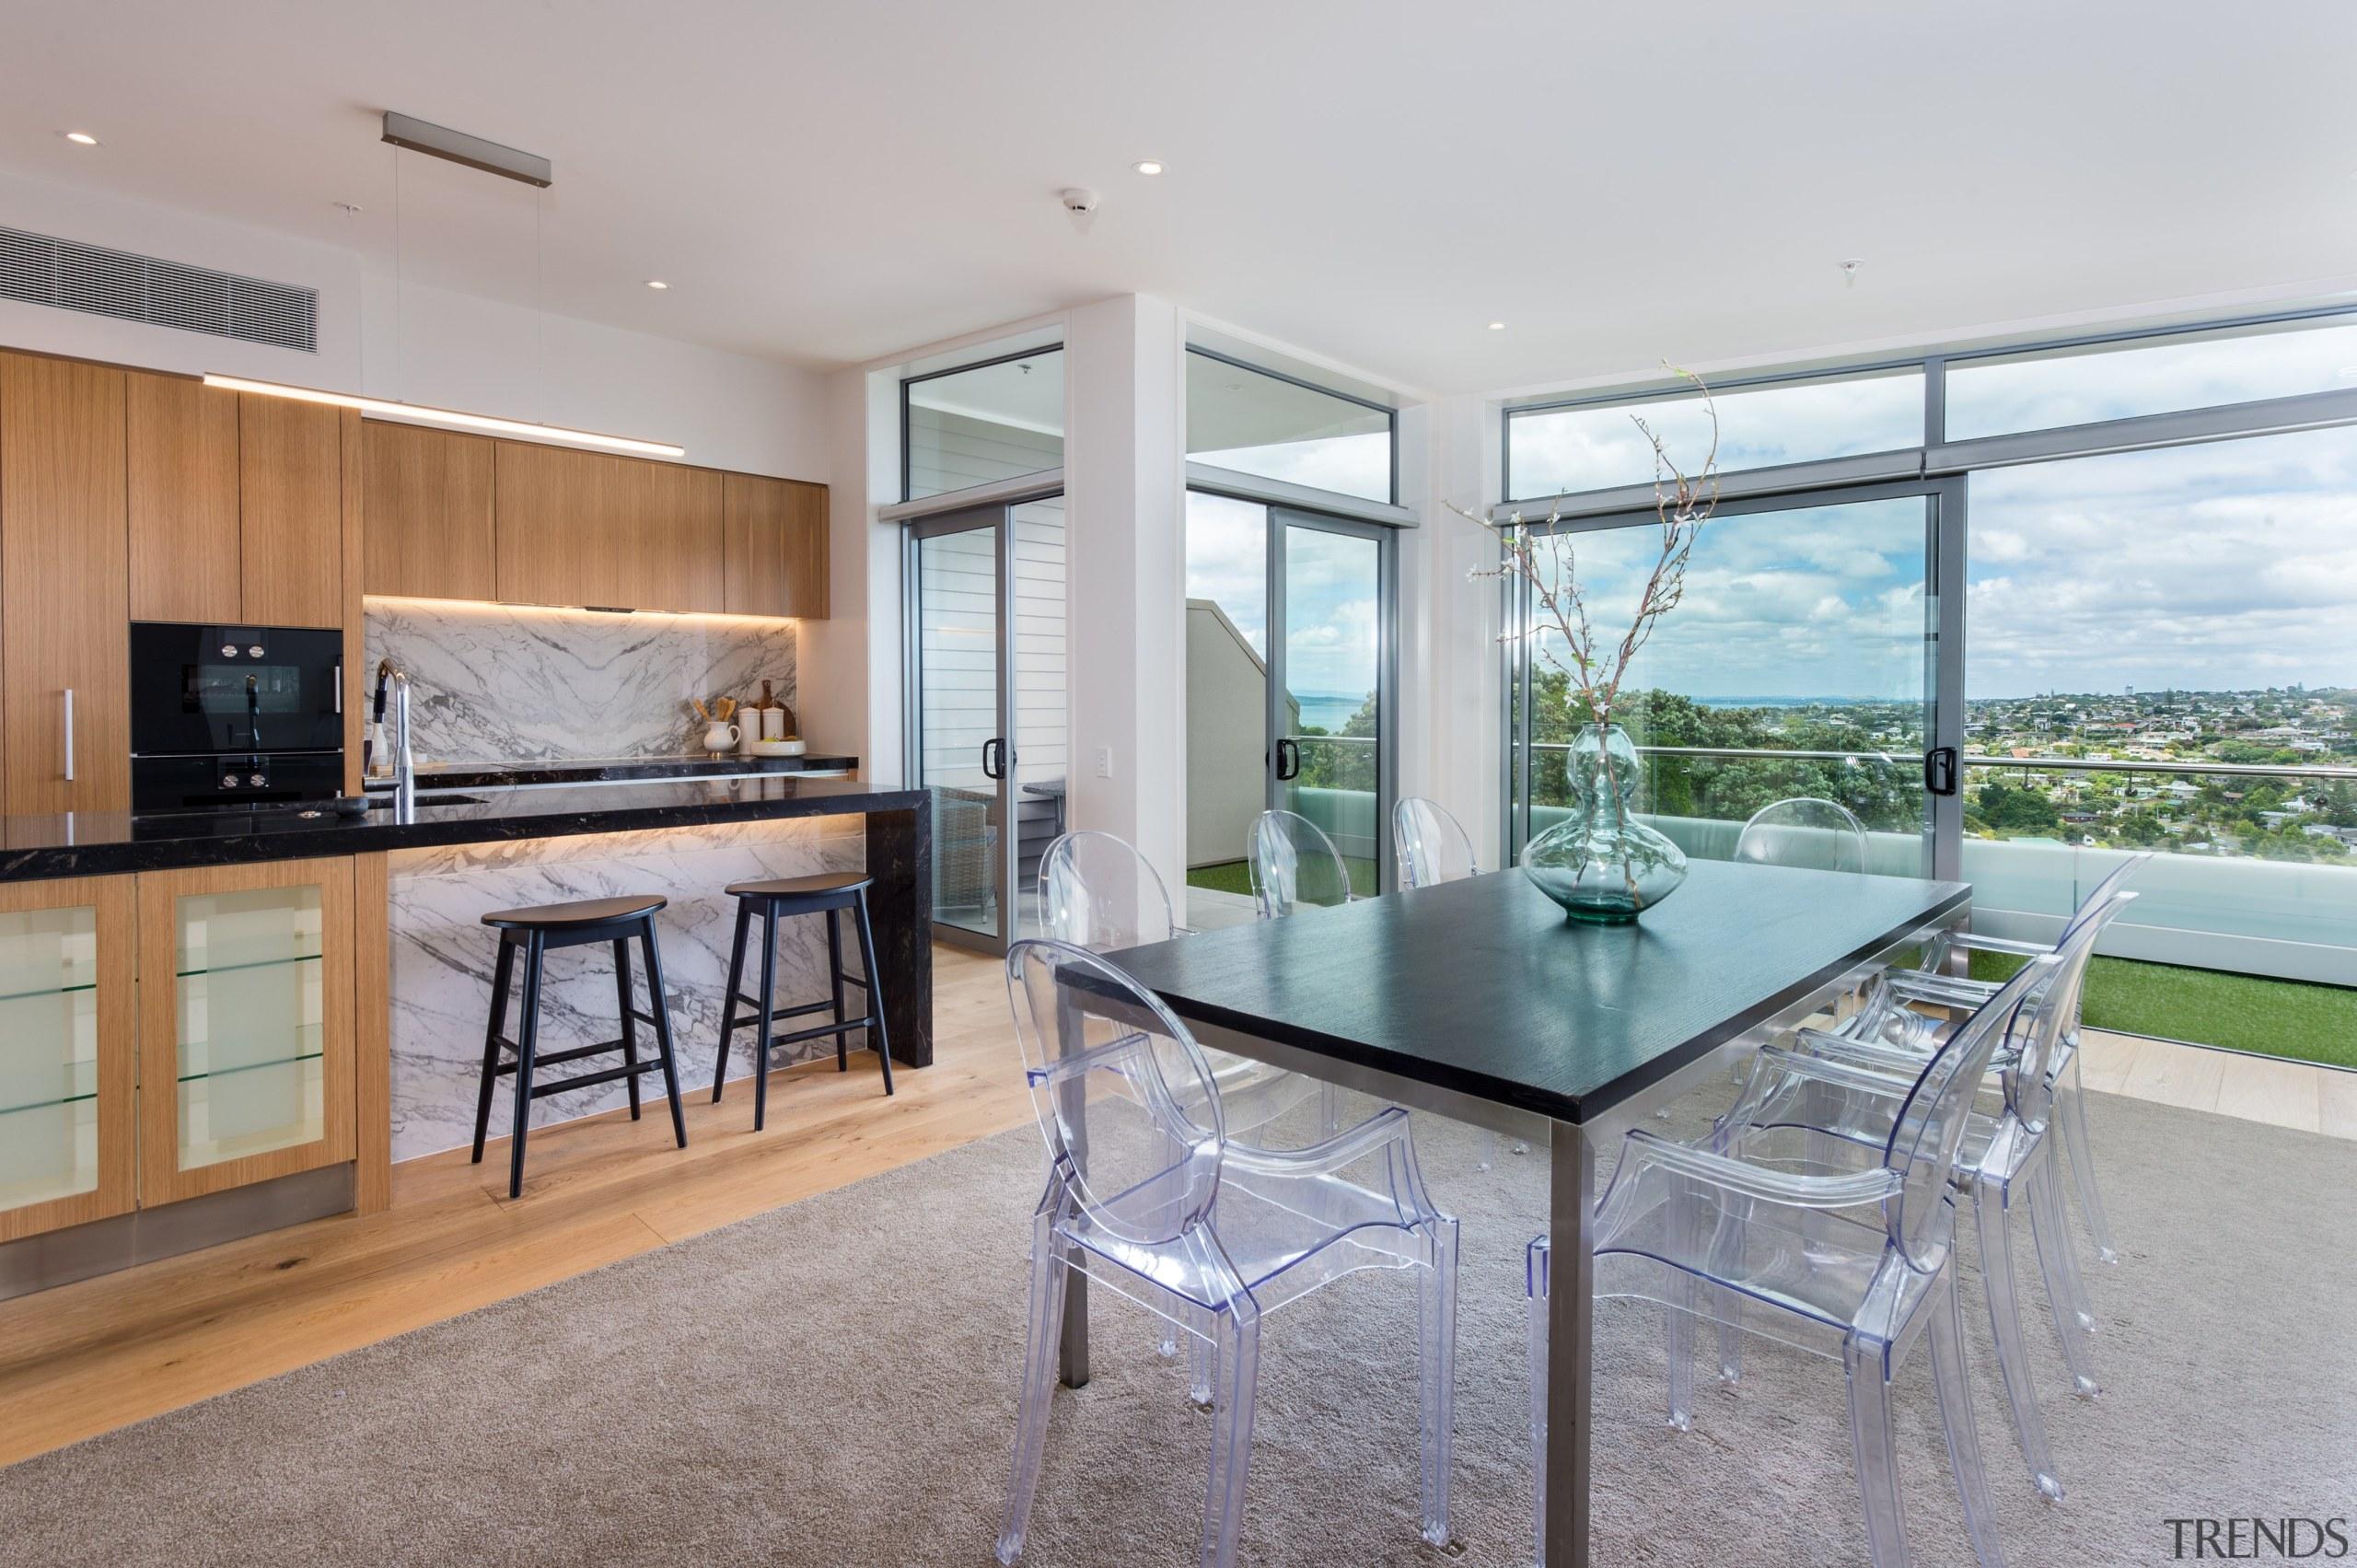 Kitchen with seaview - Kitchen with seaview - house, interior design, kitchen, real estate, gray